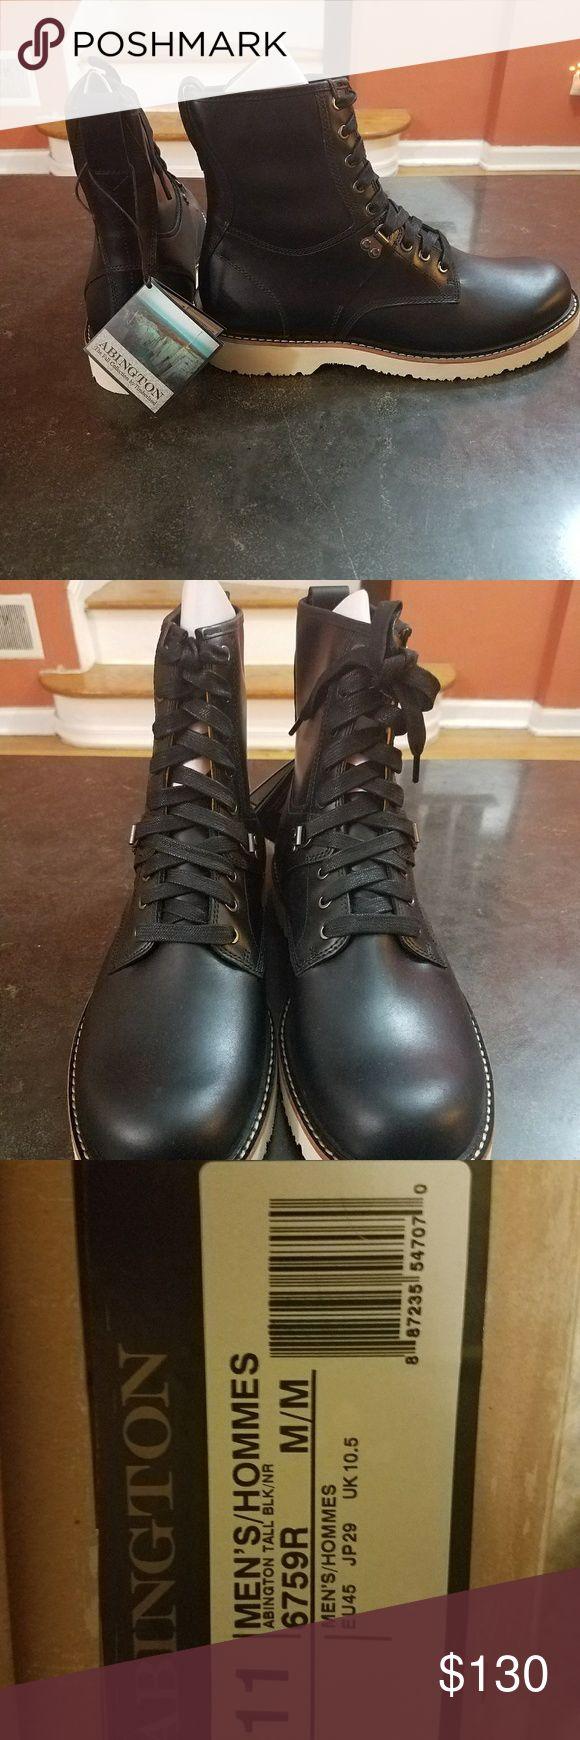 Black boots Abington Timberland Black Abington Timberland boots Timberland Shoes Boots